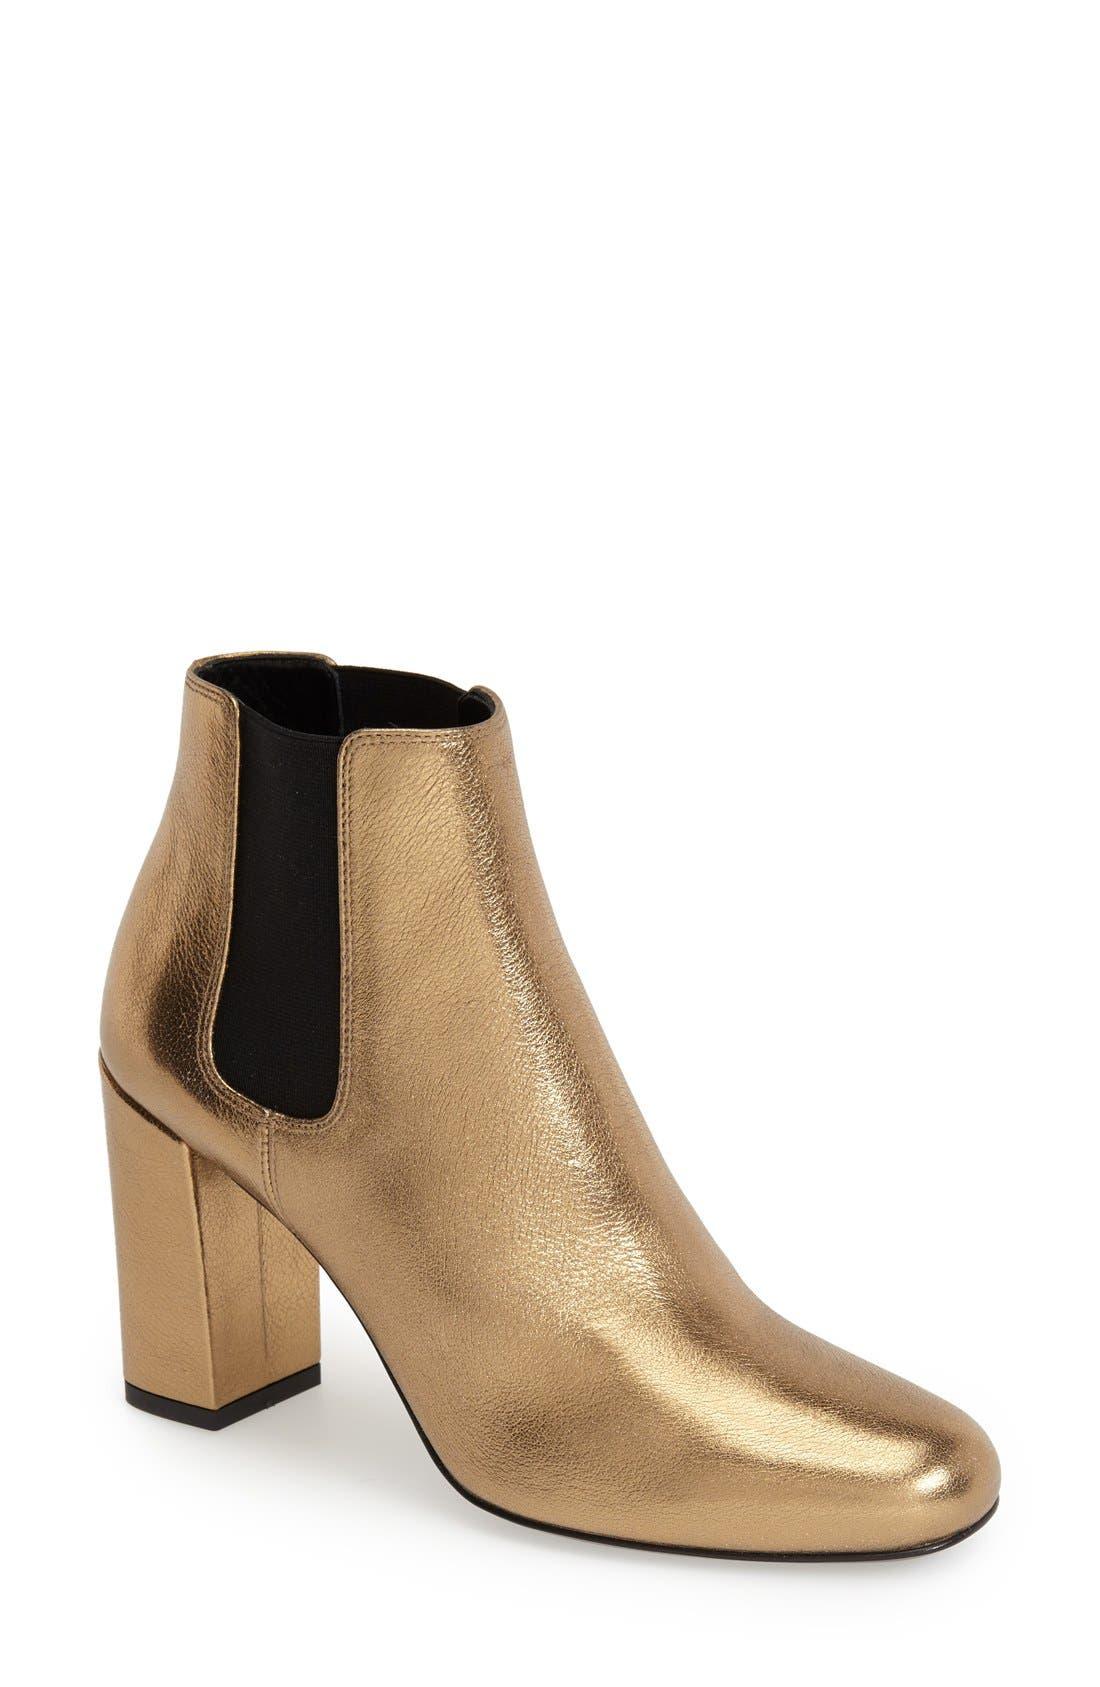 Main Image - Saint Laurent 'Babies' Chelsea Boot (Women)